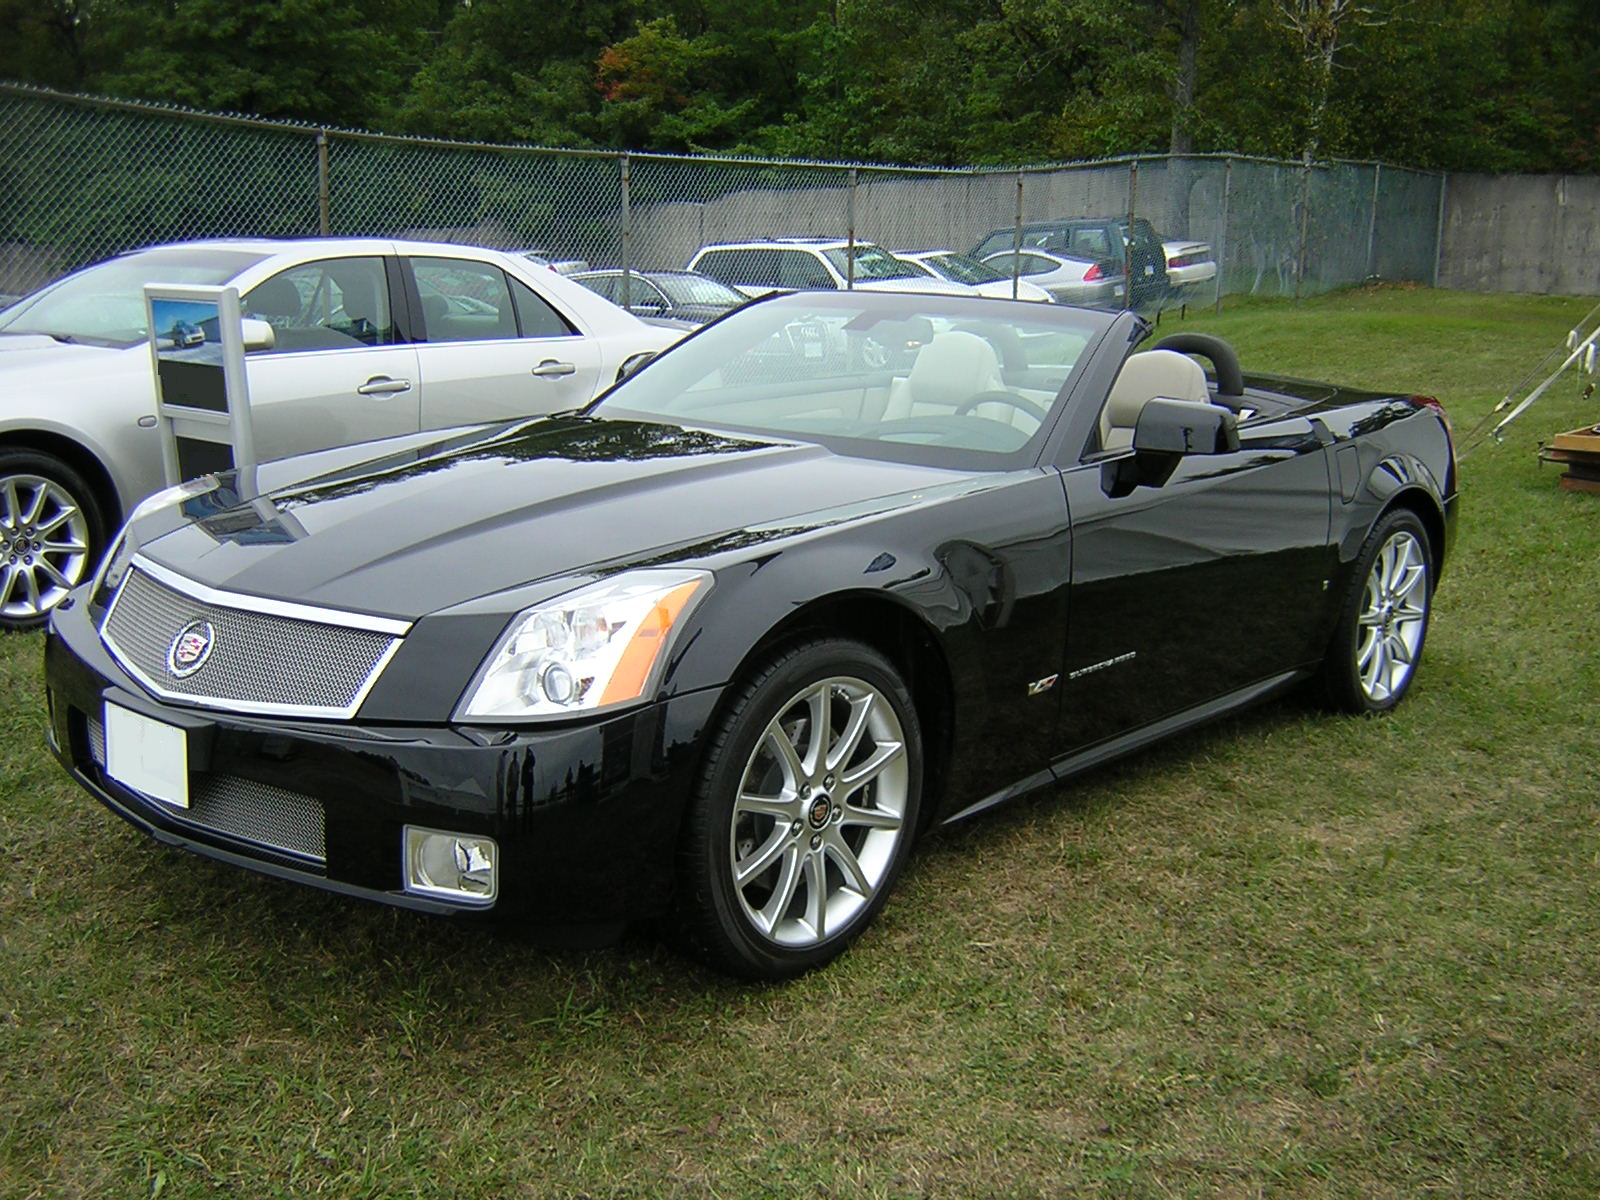 scorpio, BMW, Mercedes, Cadillac BLS, Honda Legend, Honda Jazz, Lexus, Hammer